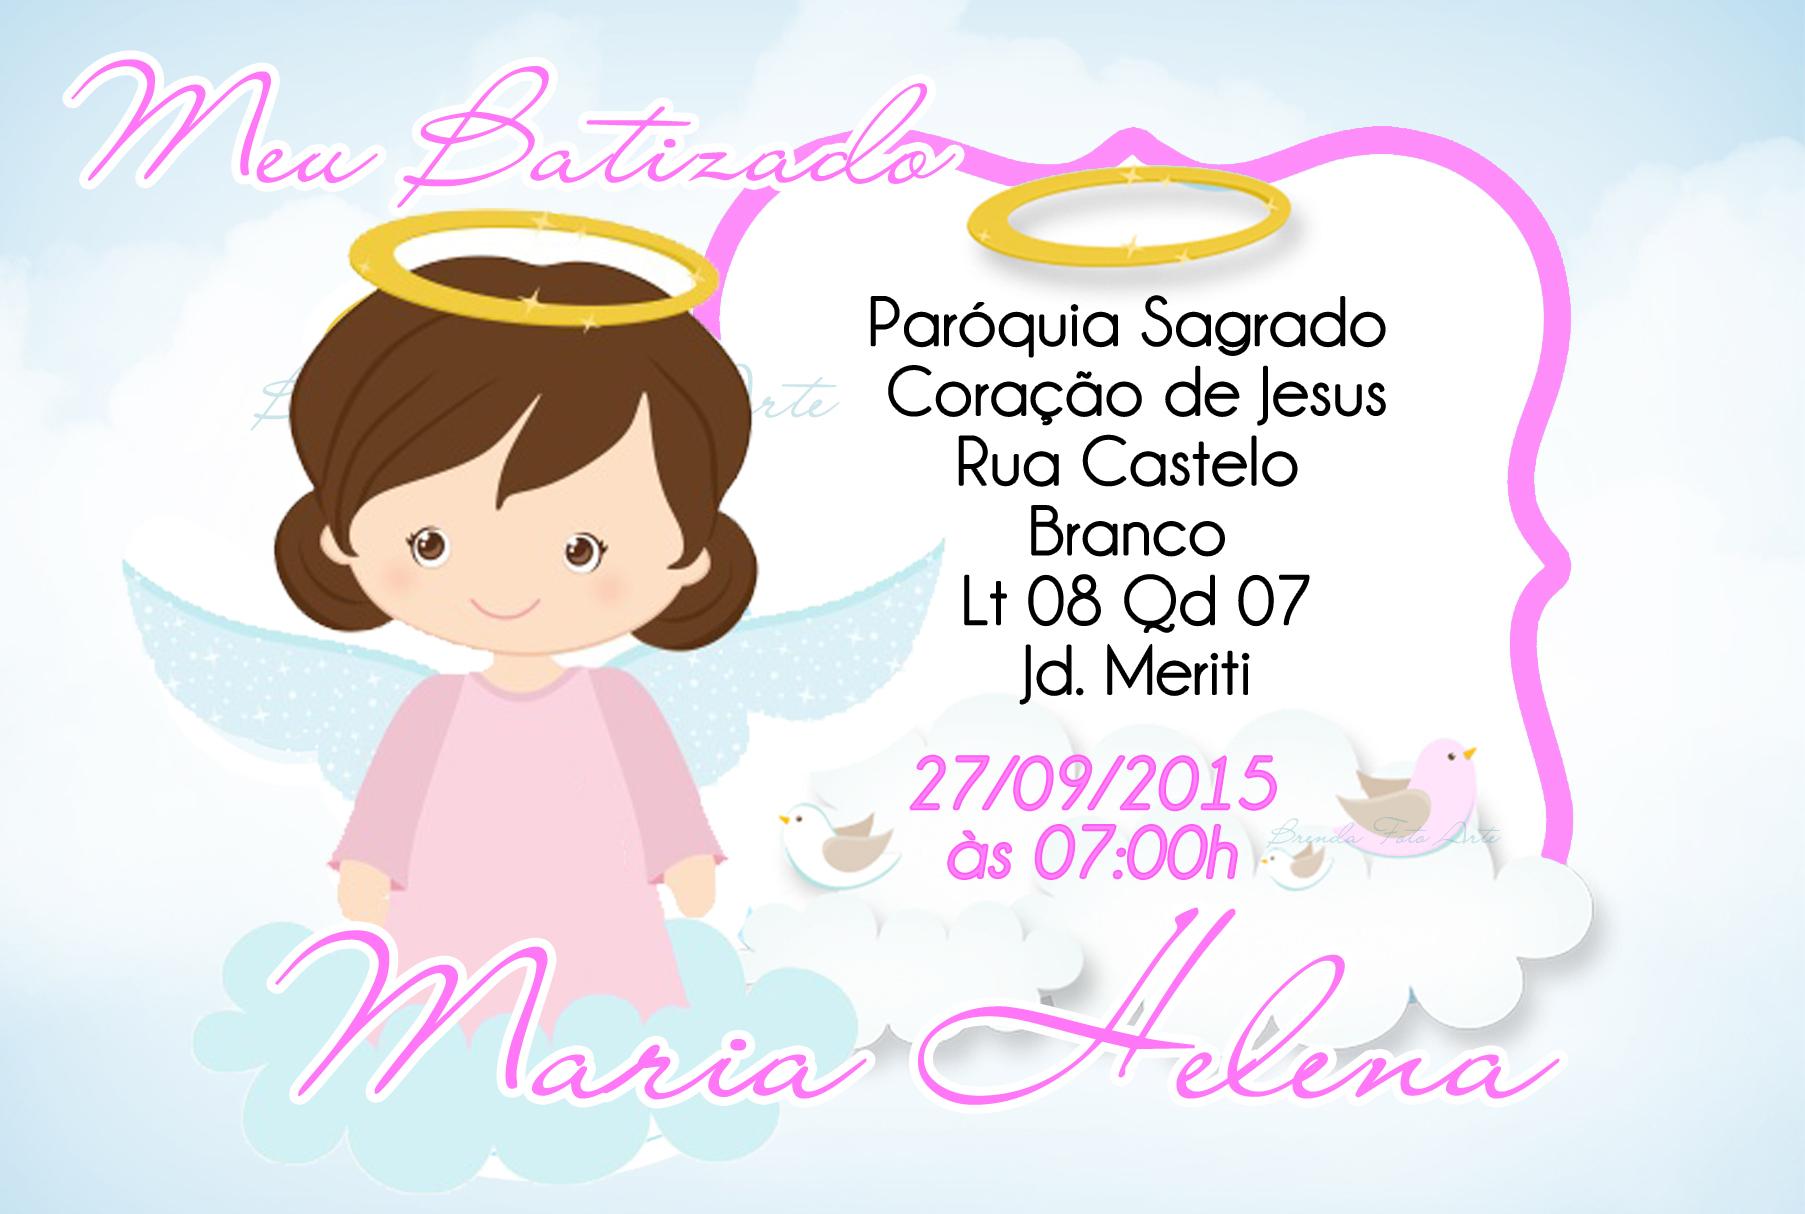 Convite Batizado Menina No Elo7 Brenda Foto Arte 5b06b3